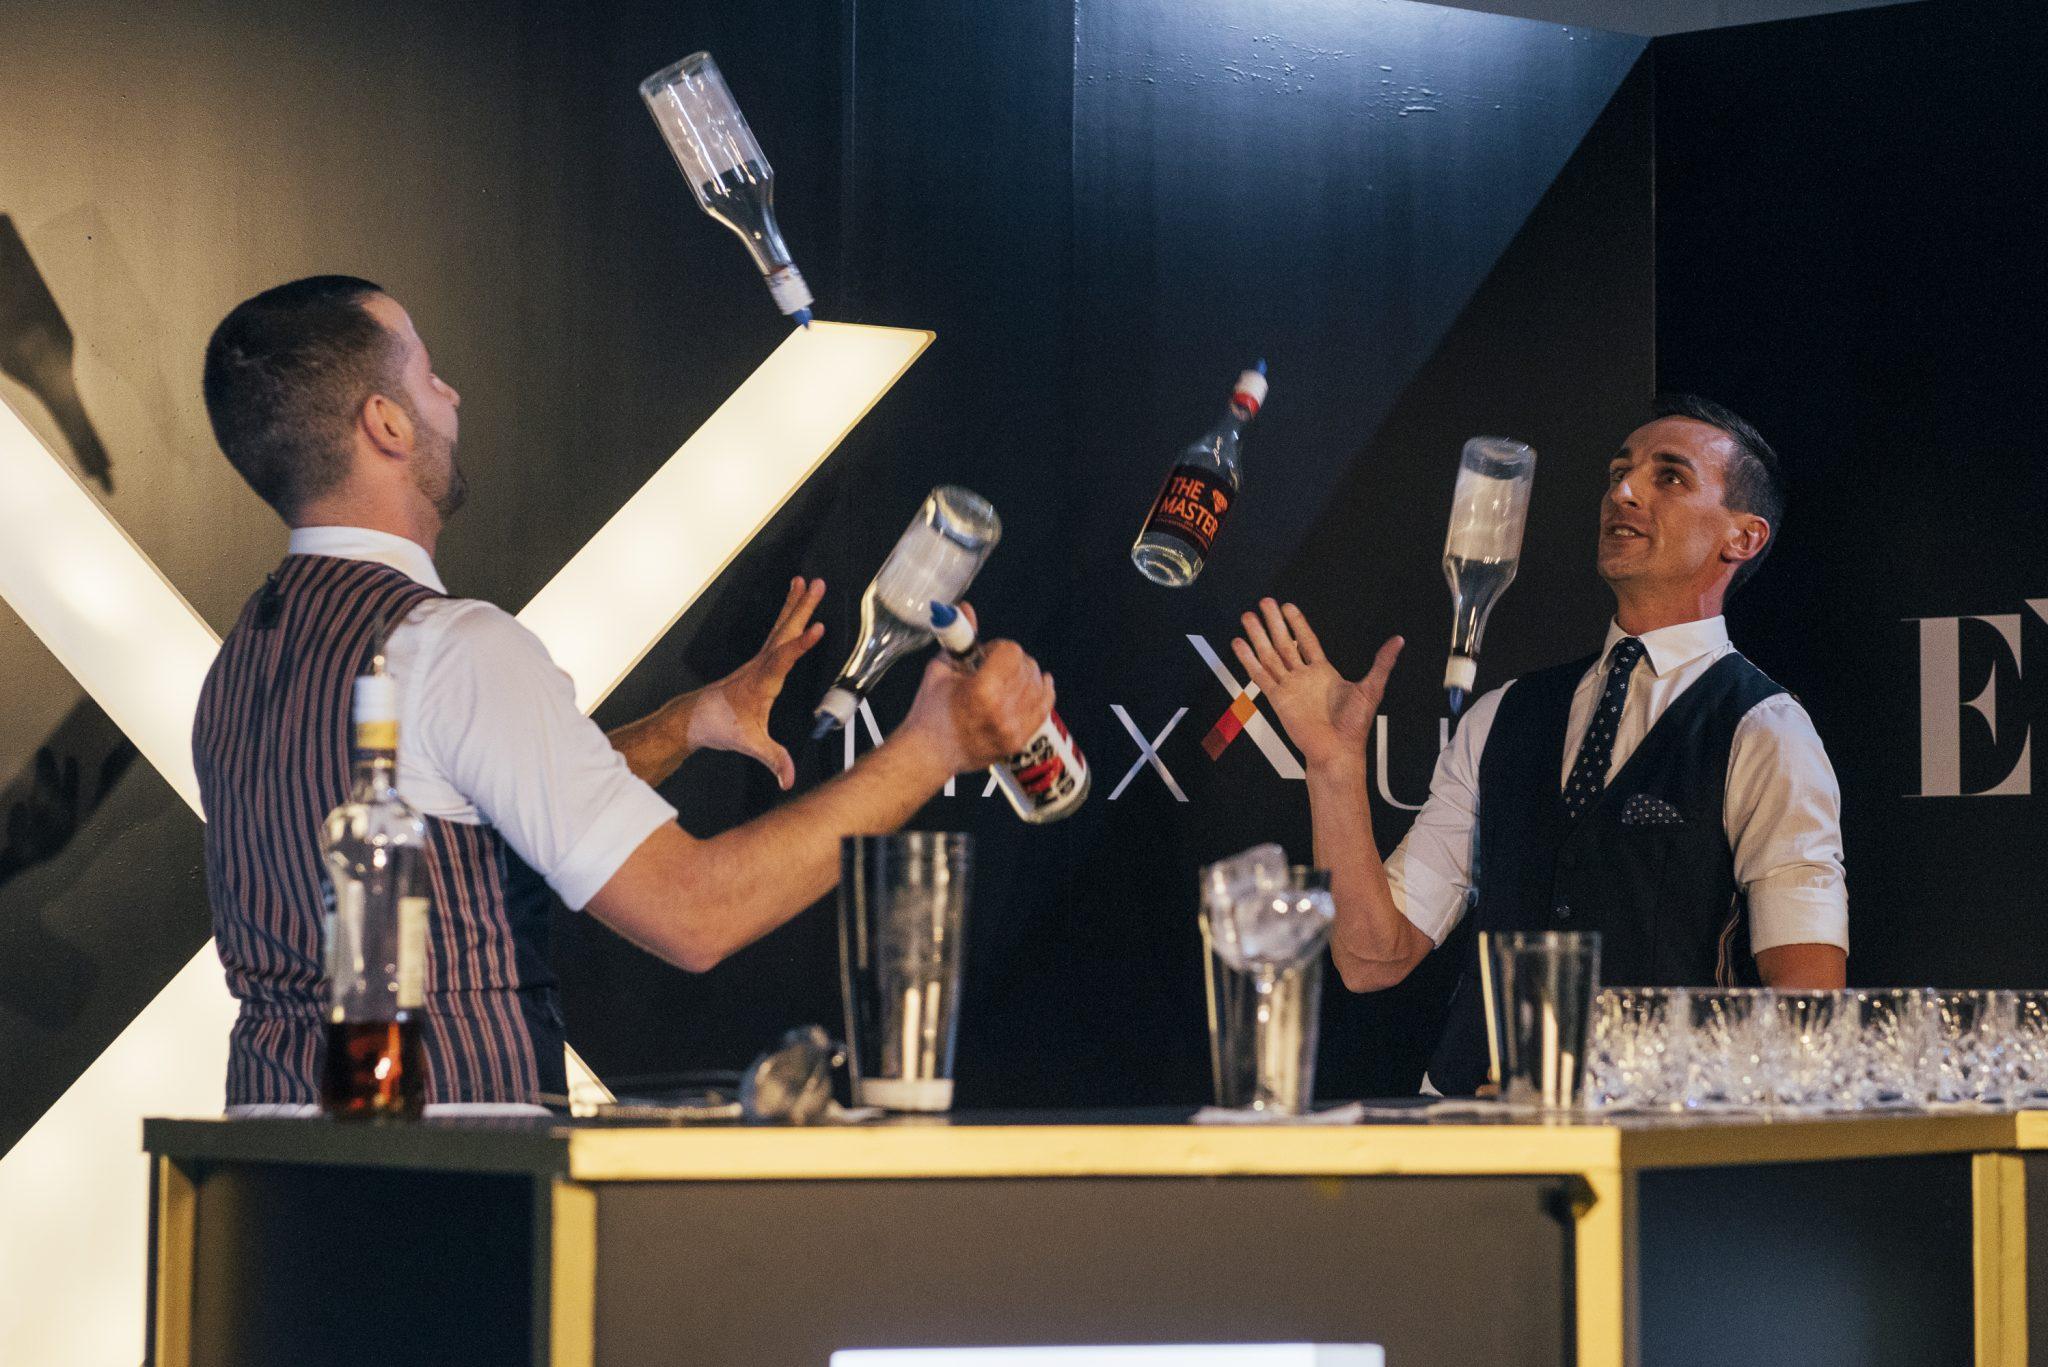 flair bartender show